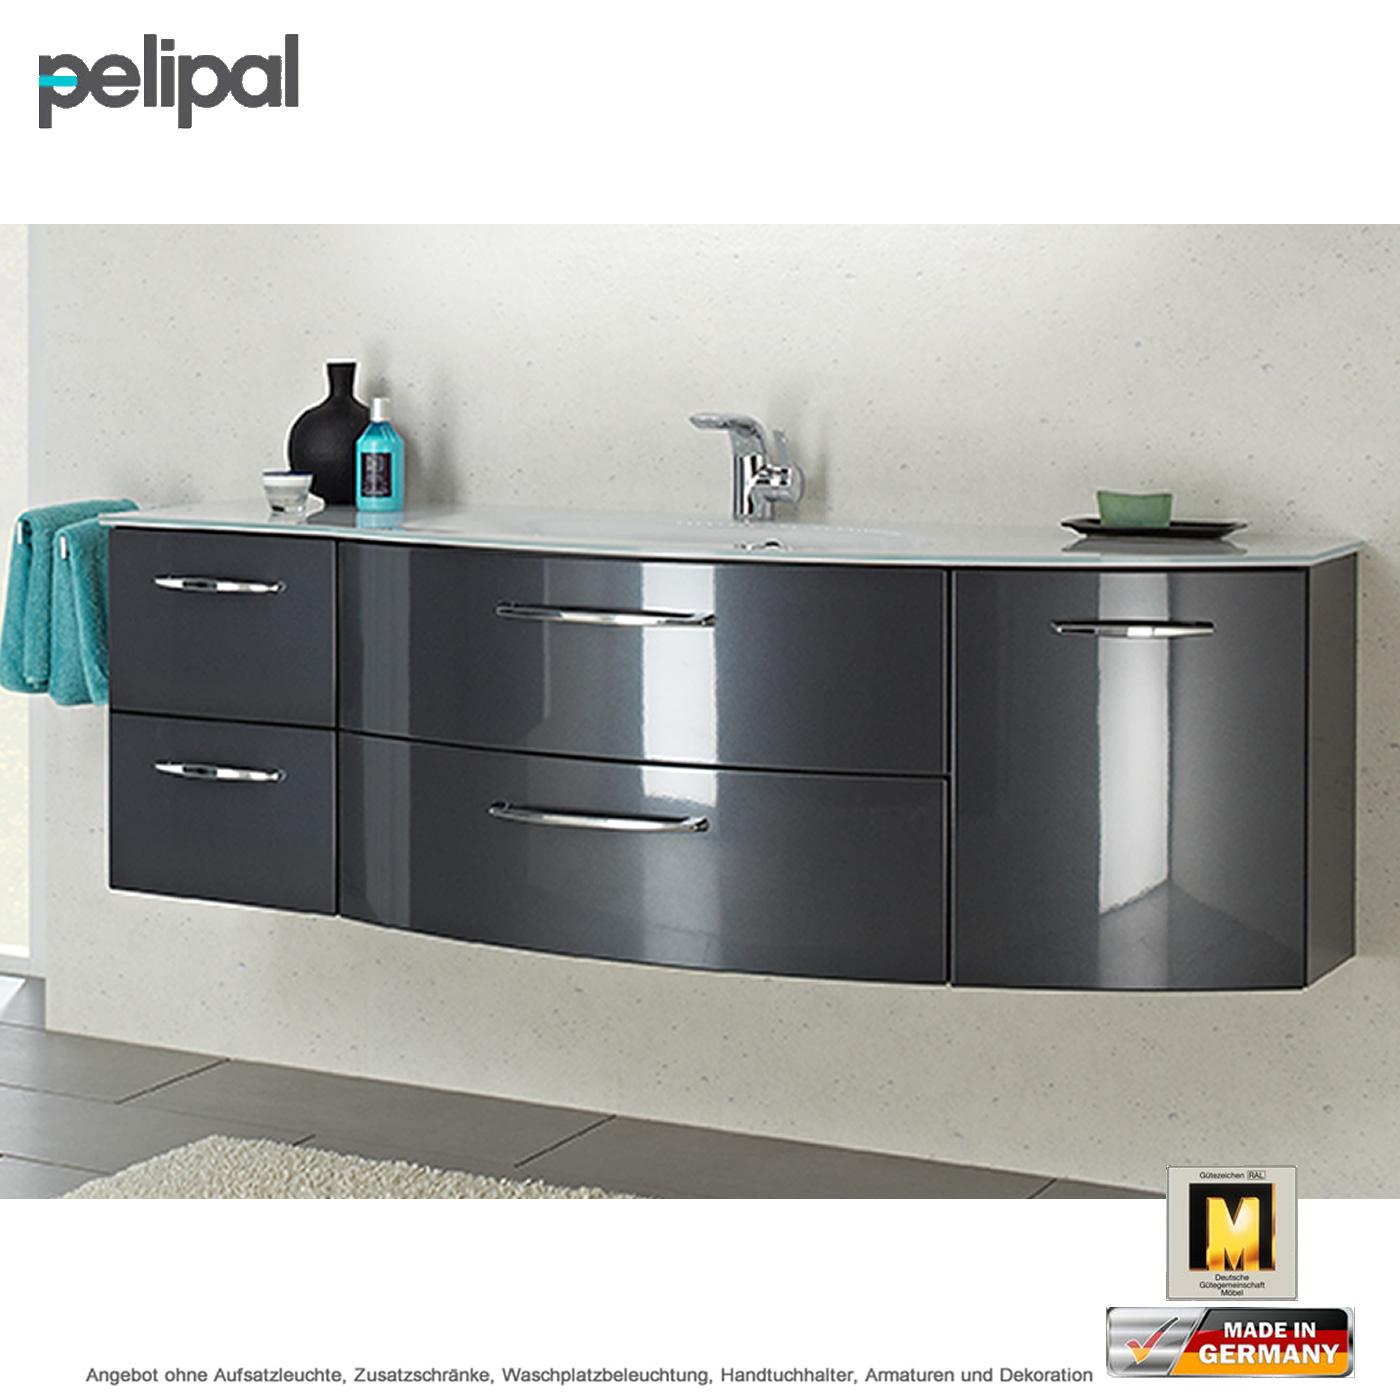 pelipal solitaire 7005 waschtischset 150 cm mit 4 ausz gen. Black Bedroom Furniture Sets. Home Design Ideas